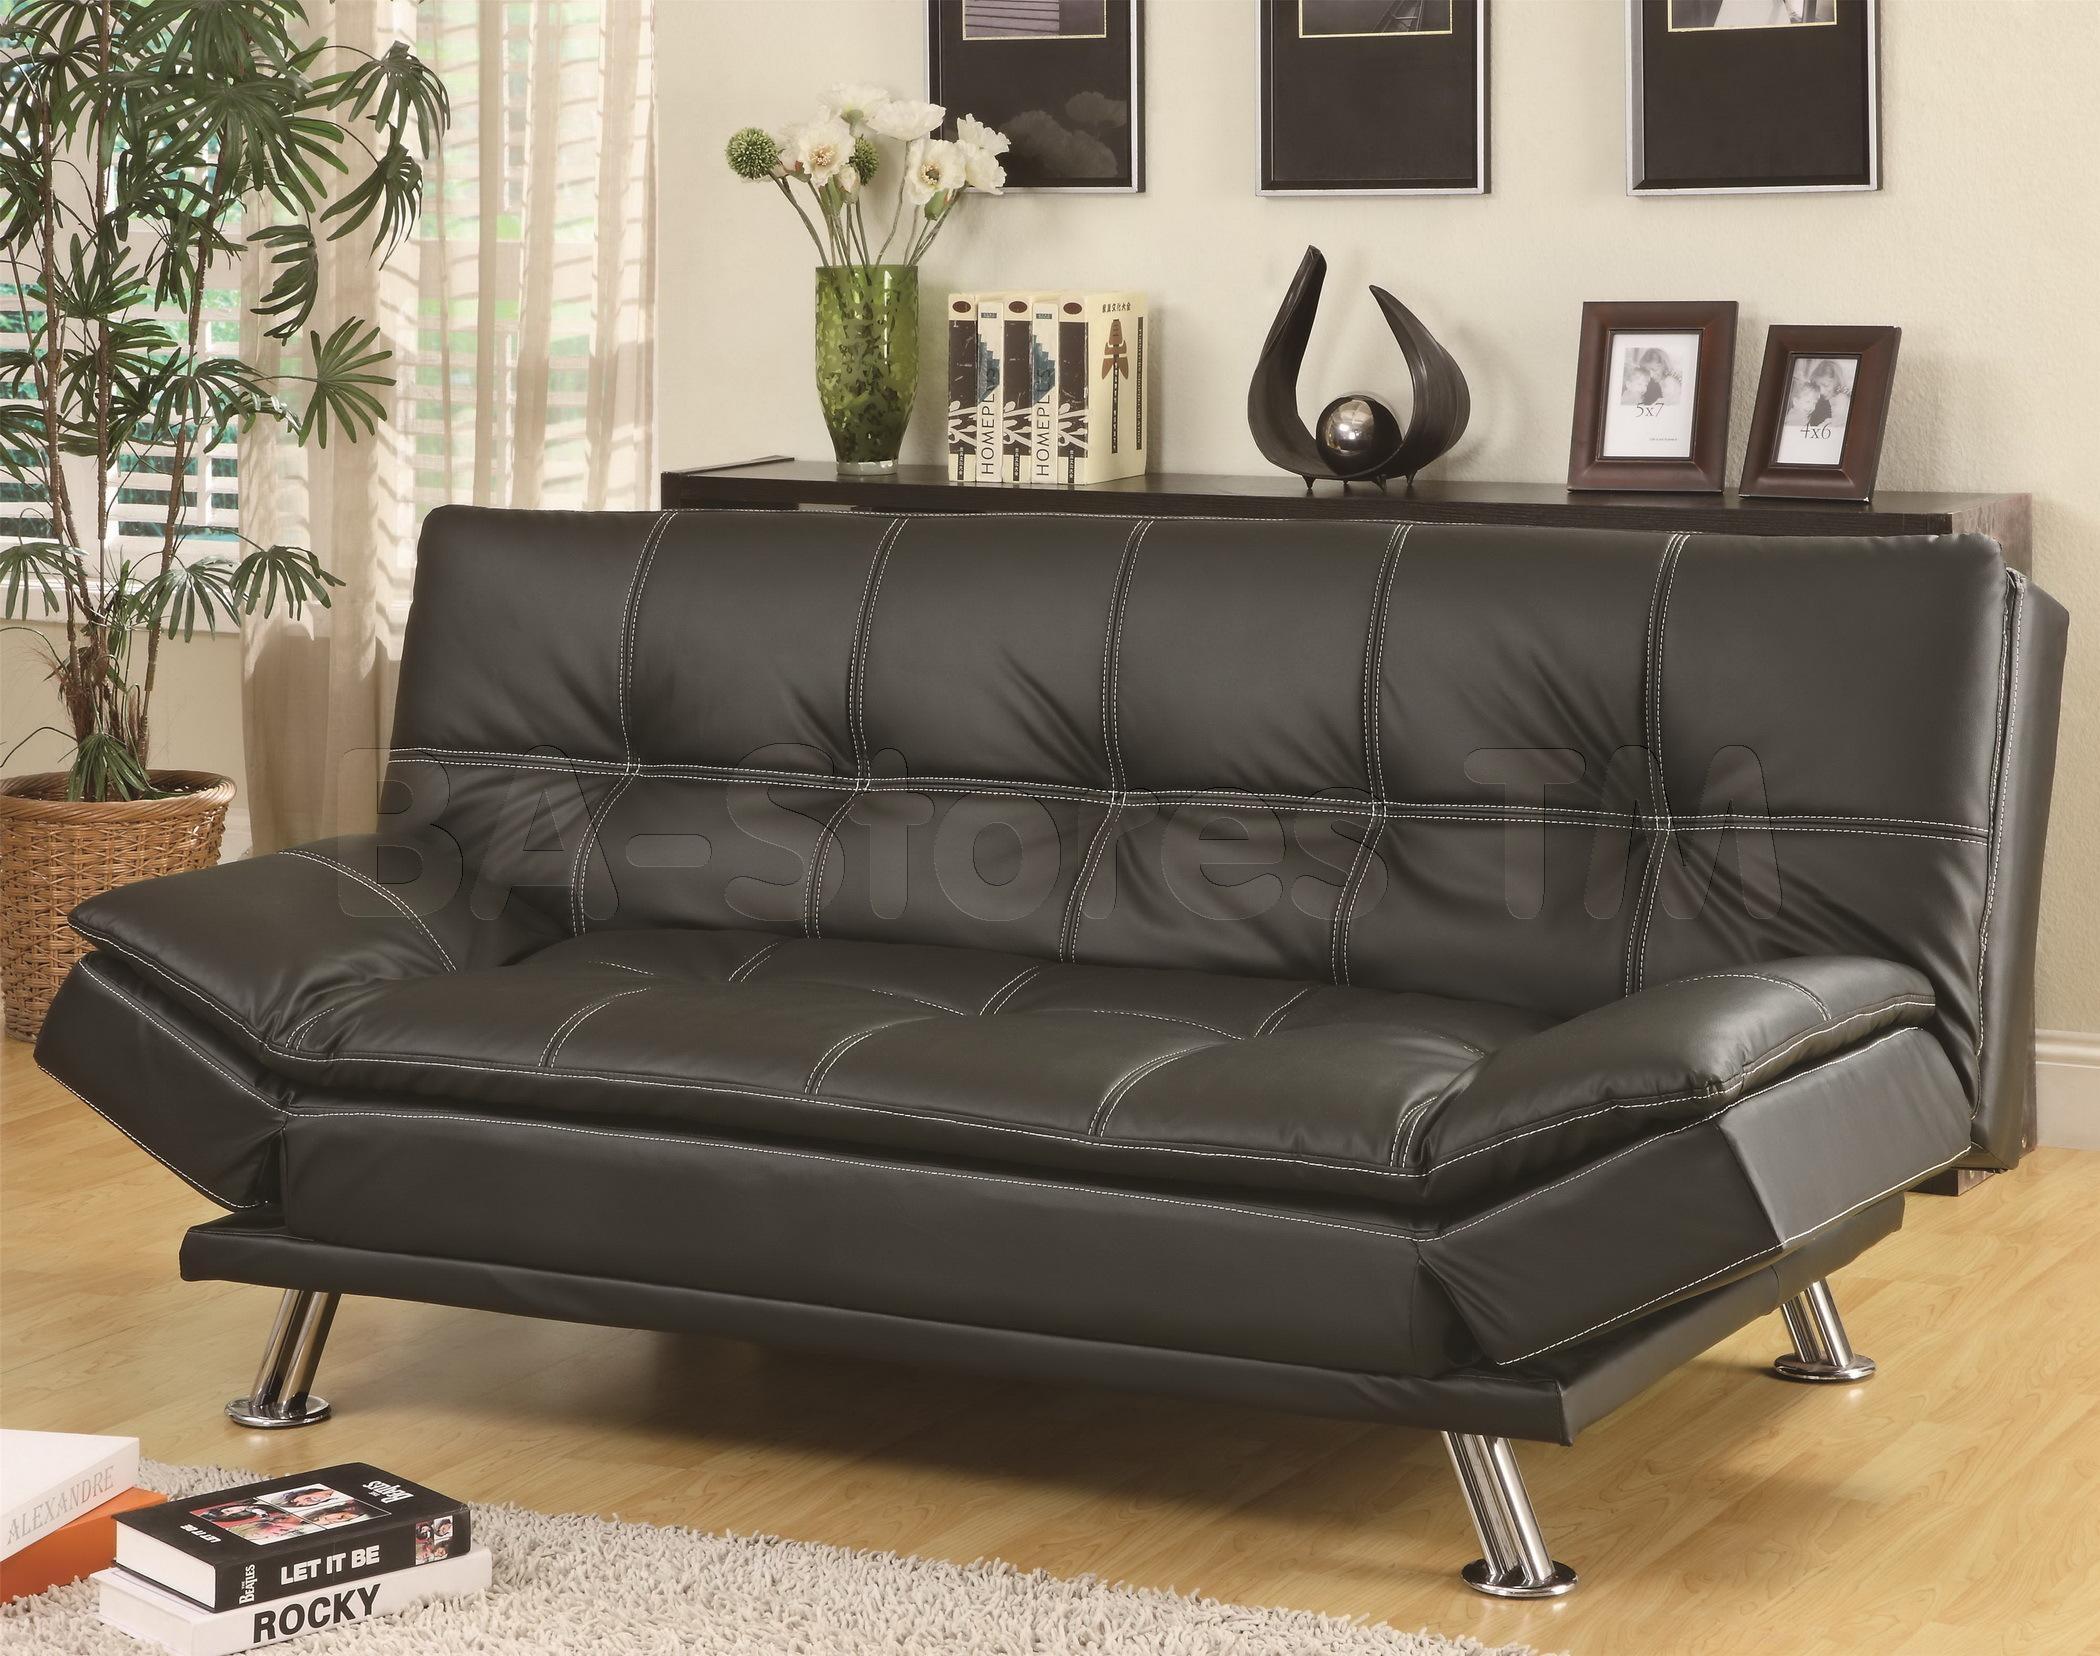 20 Best Castro Convertibles Sofa Beds Sofa Ideas